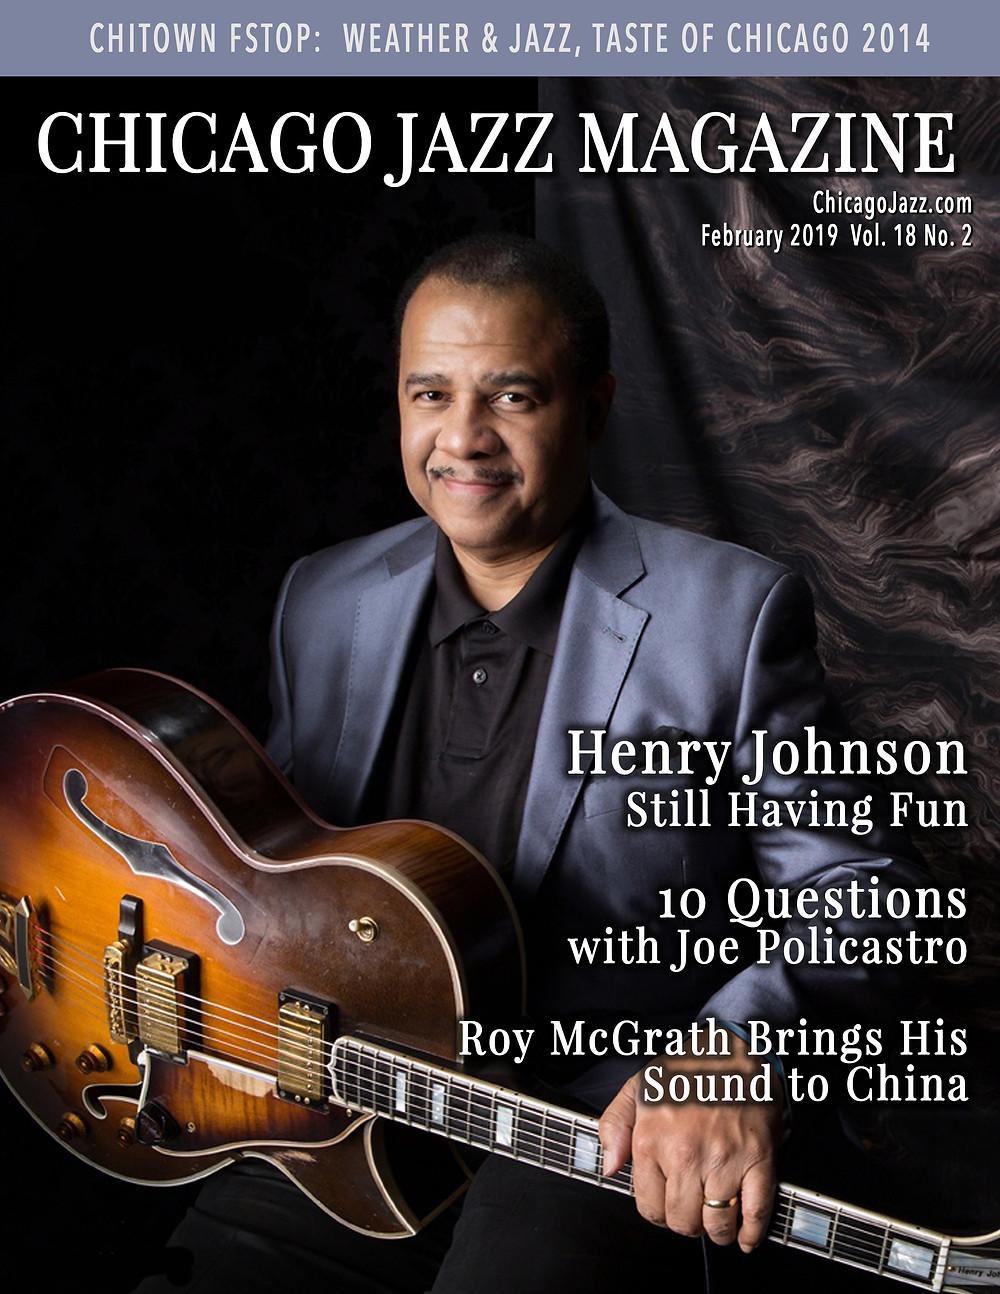 Henry Johnson - Chicago Jazz Magazine February 2019